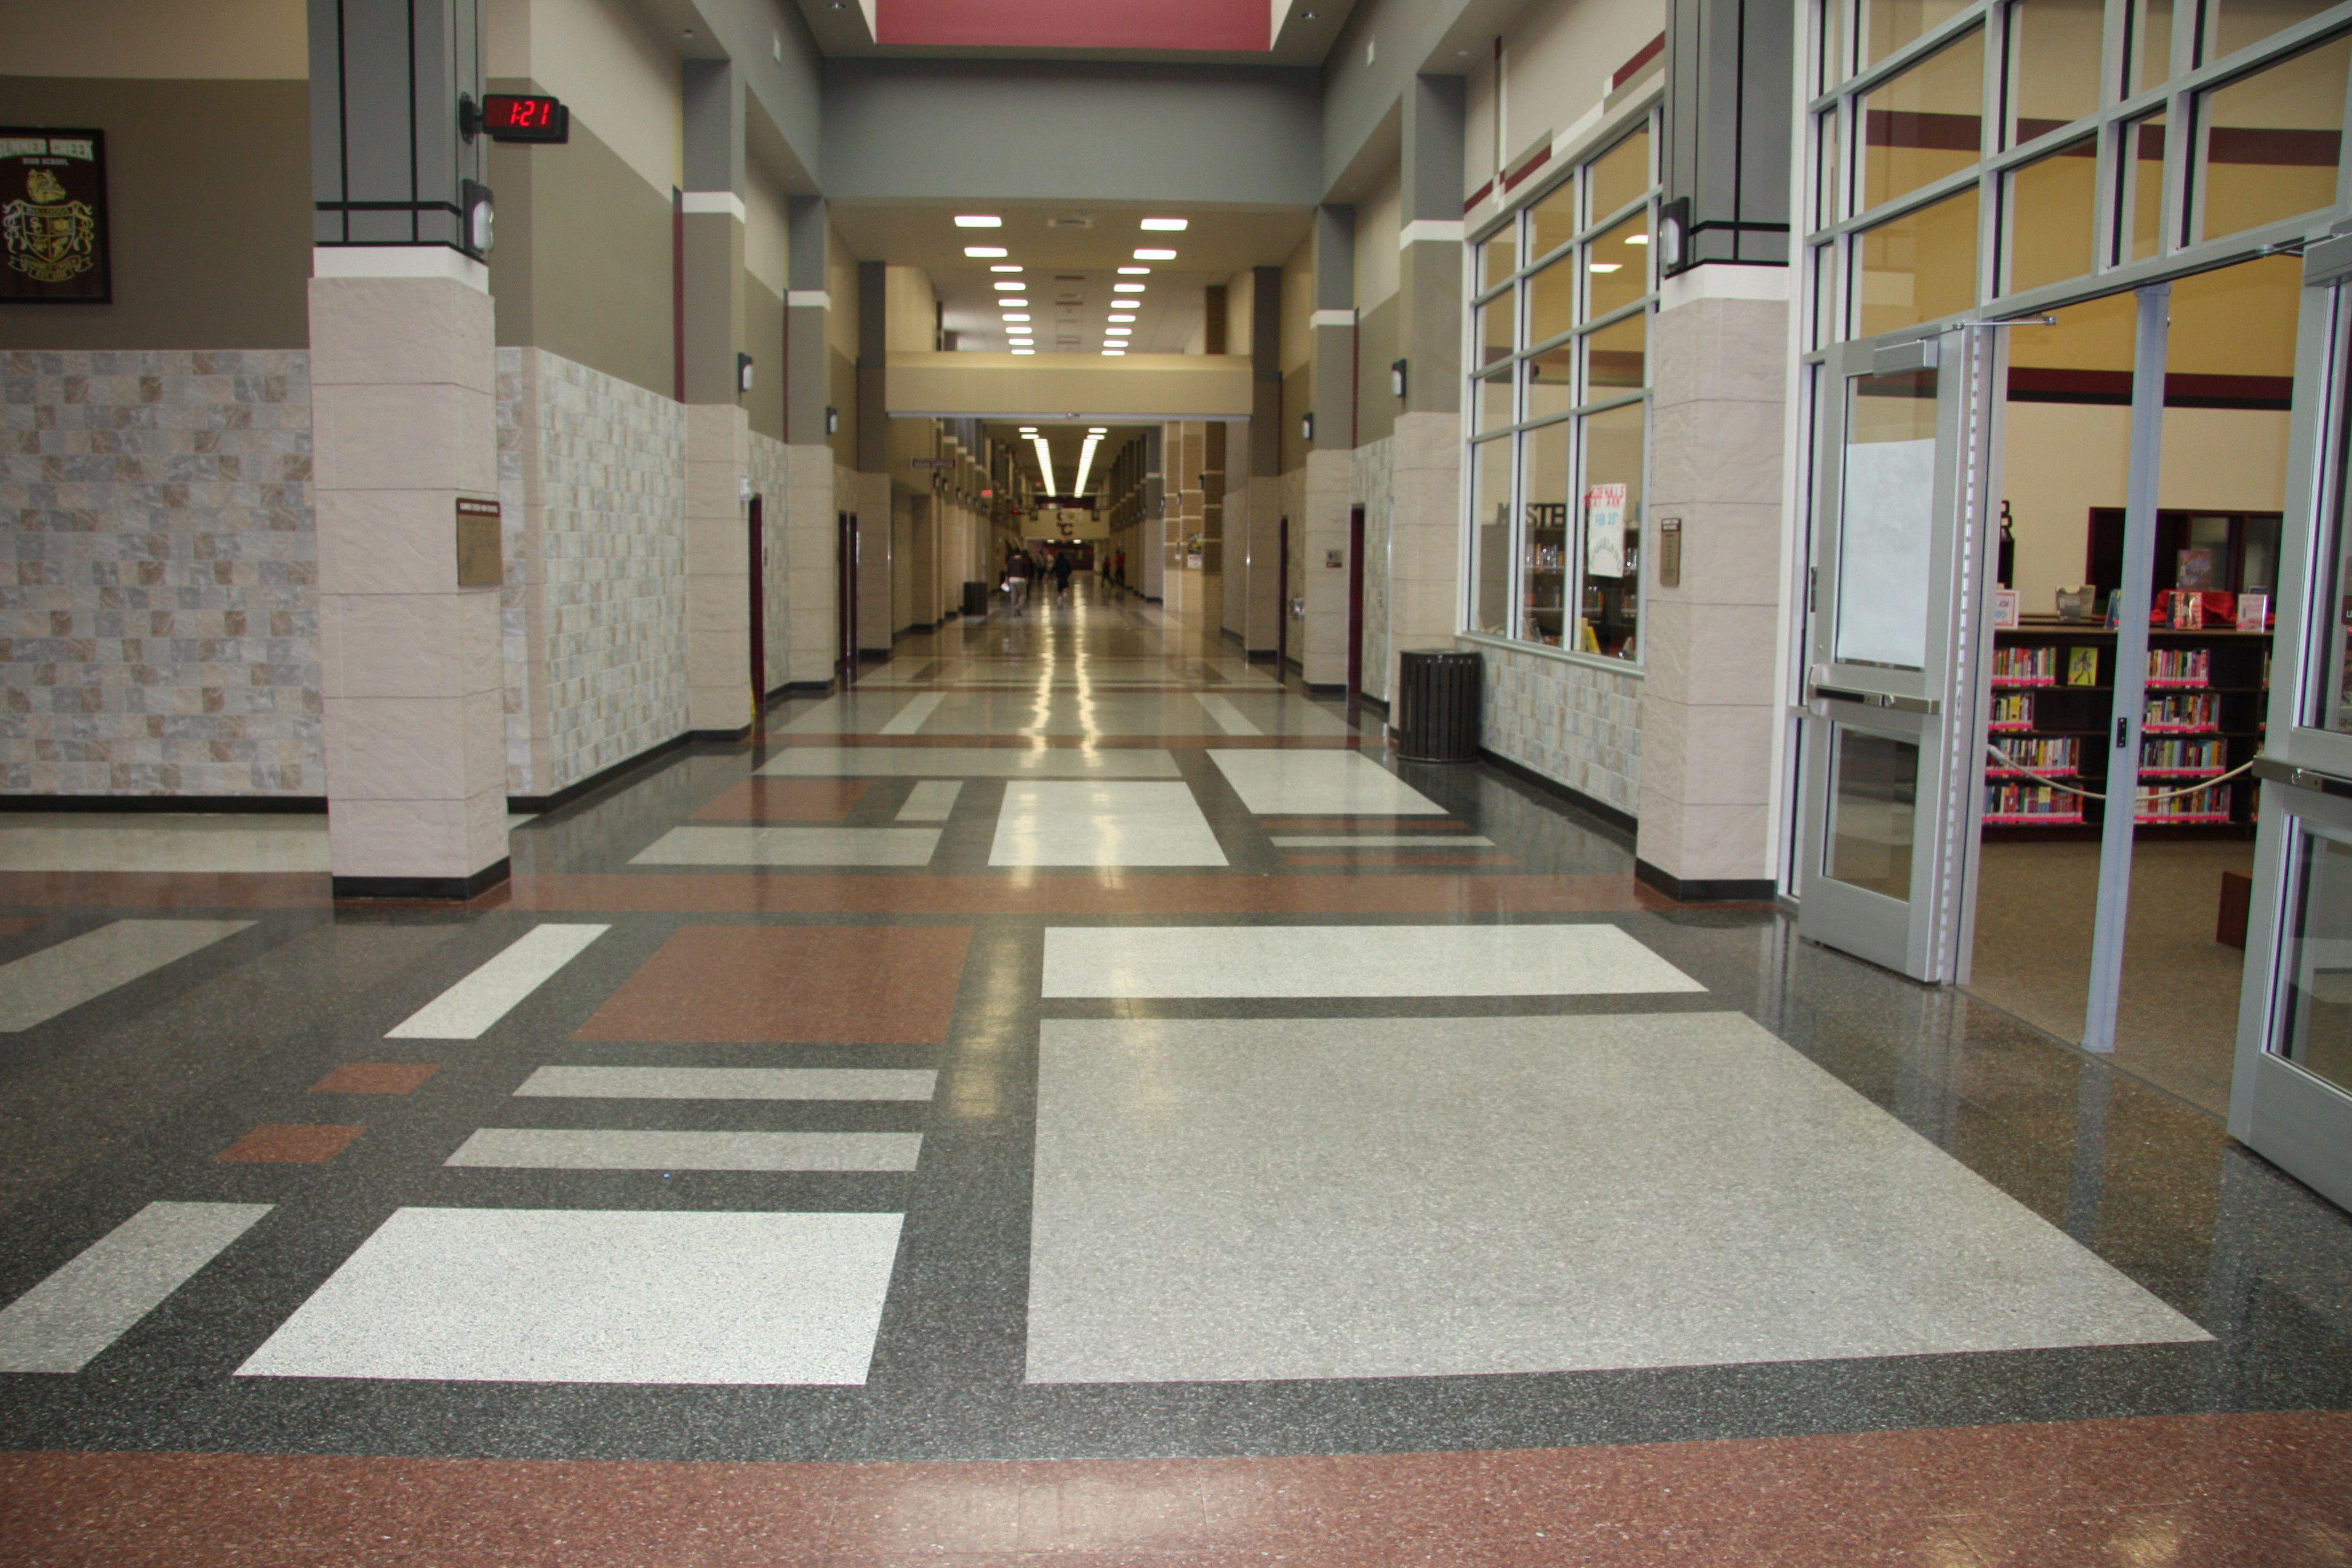 Terrazzo Flooring Design : Custom patterns with fritztile terrazzo tile flooring